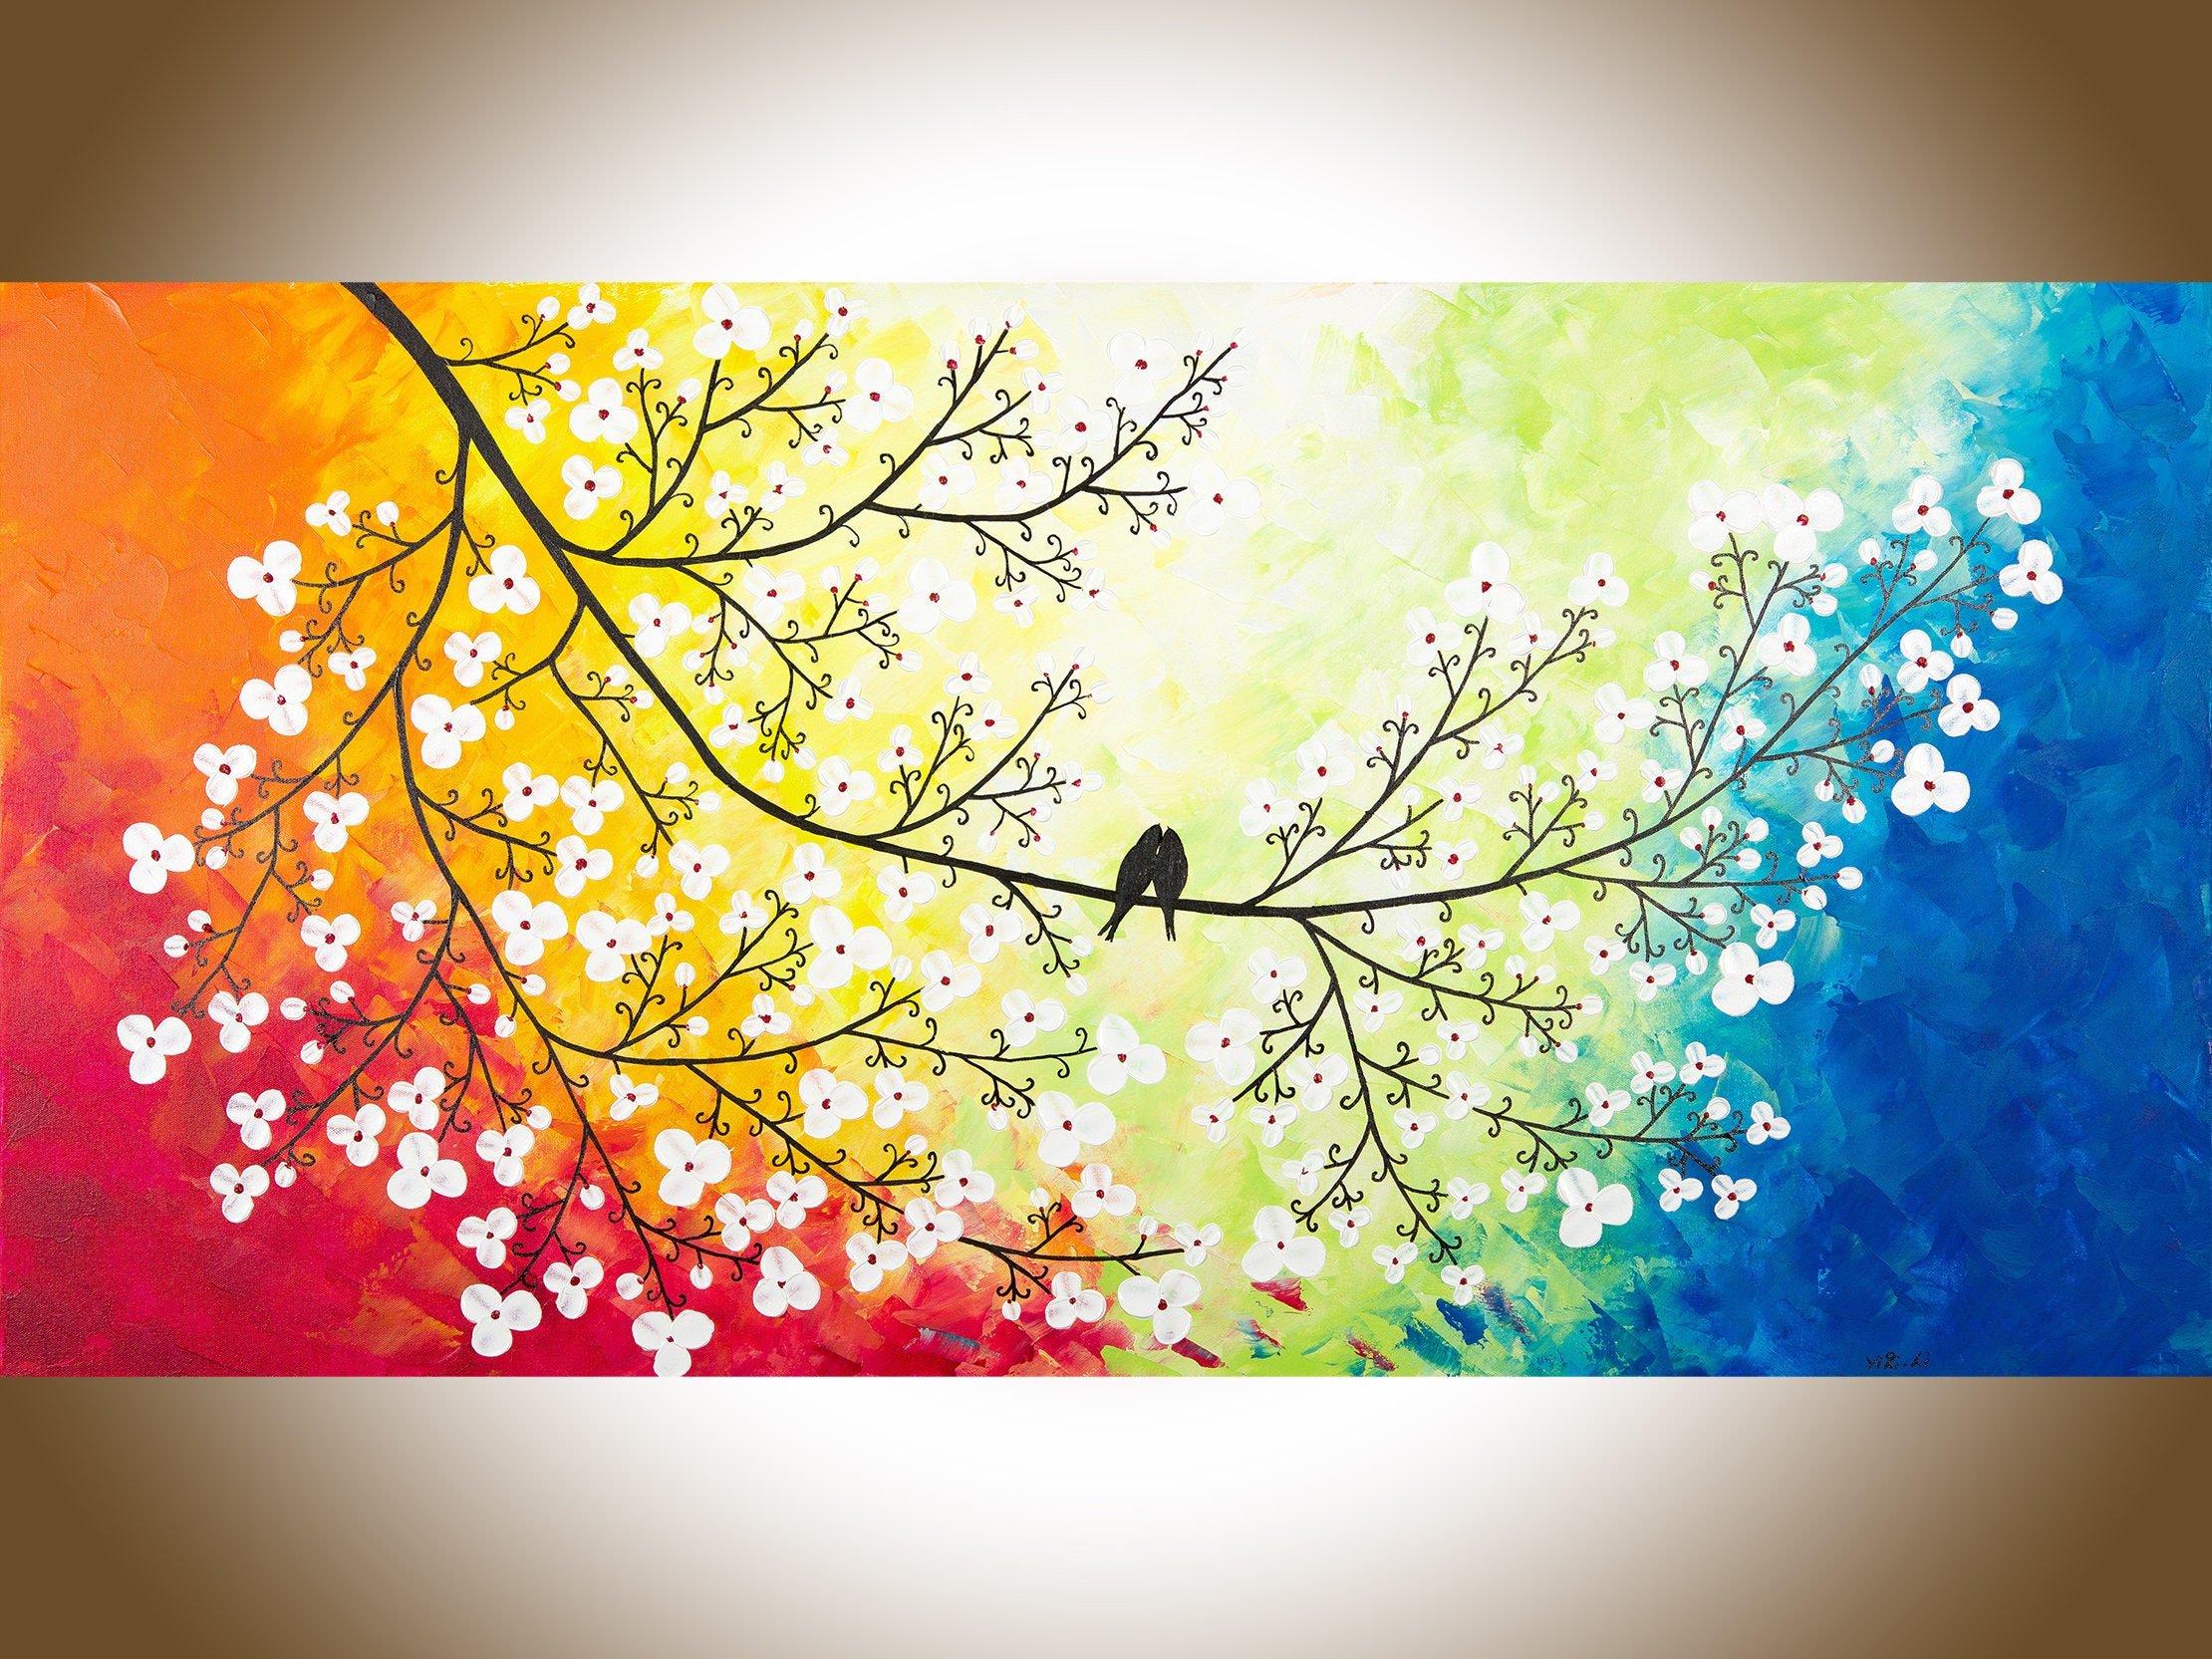 large wall art colourful love birds art red yellow orange blue. Black Bedroom Furniture Sets. Home Design Ideas